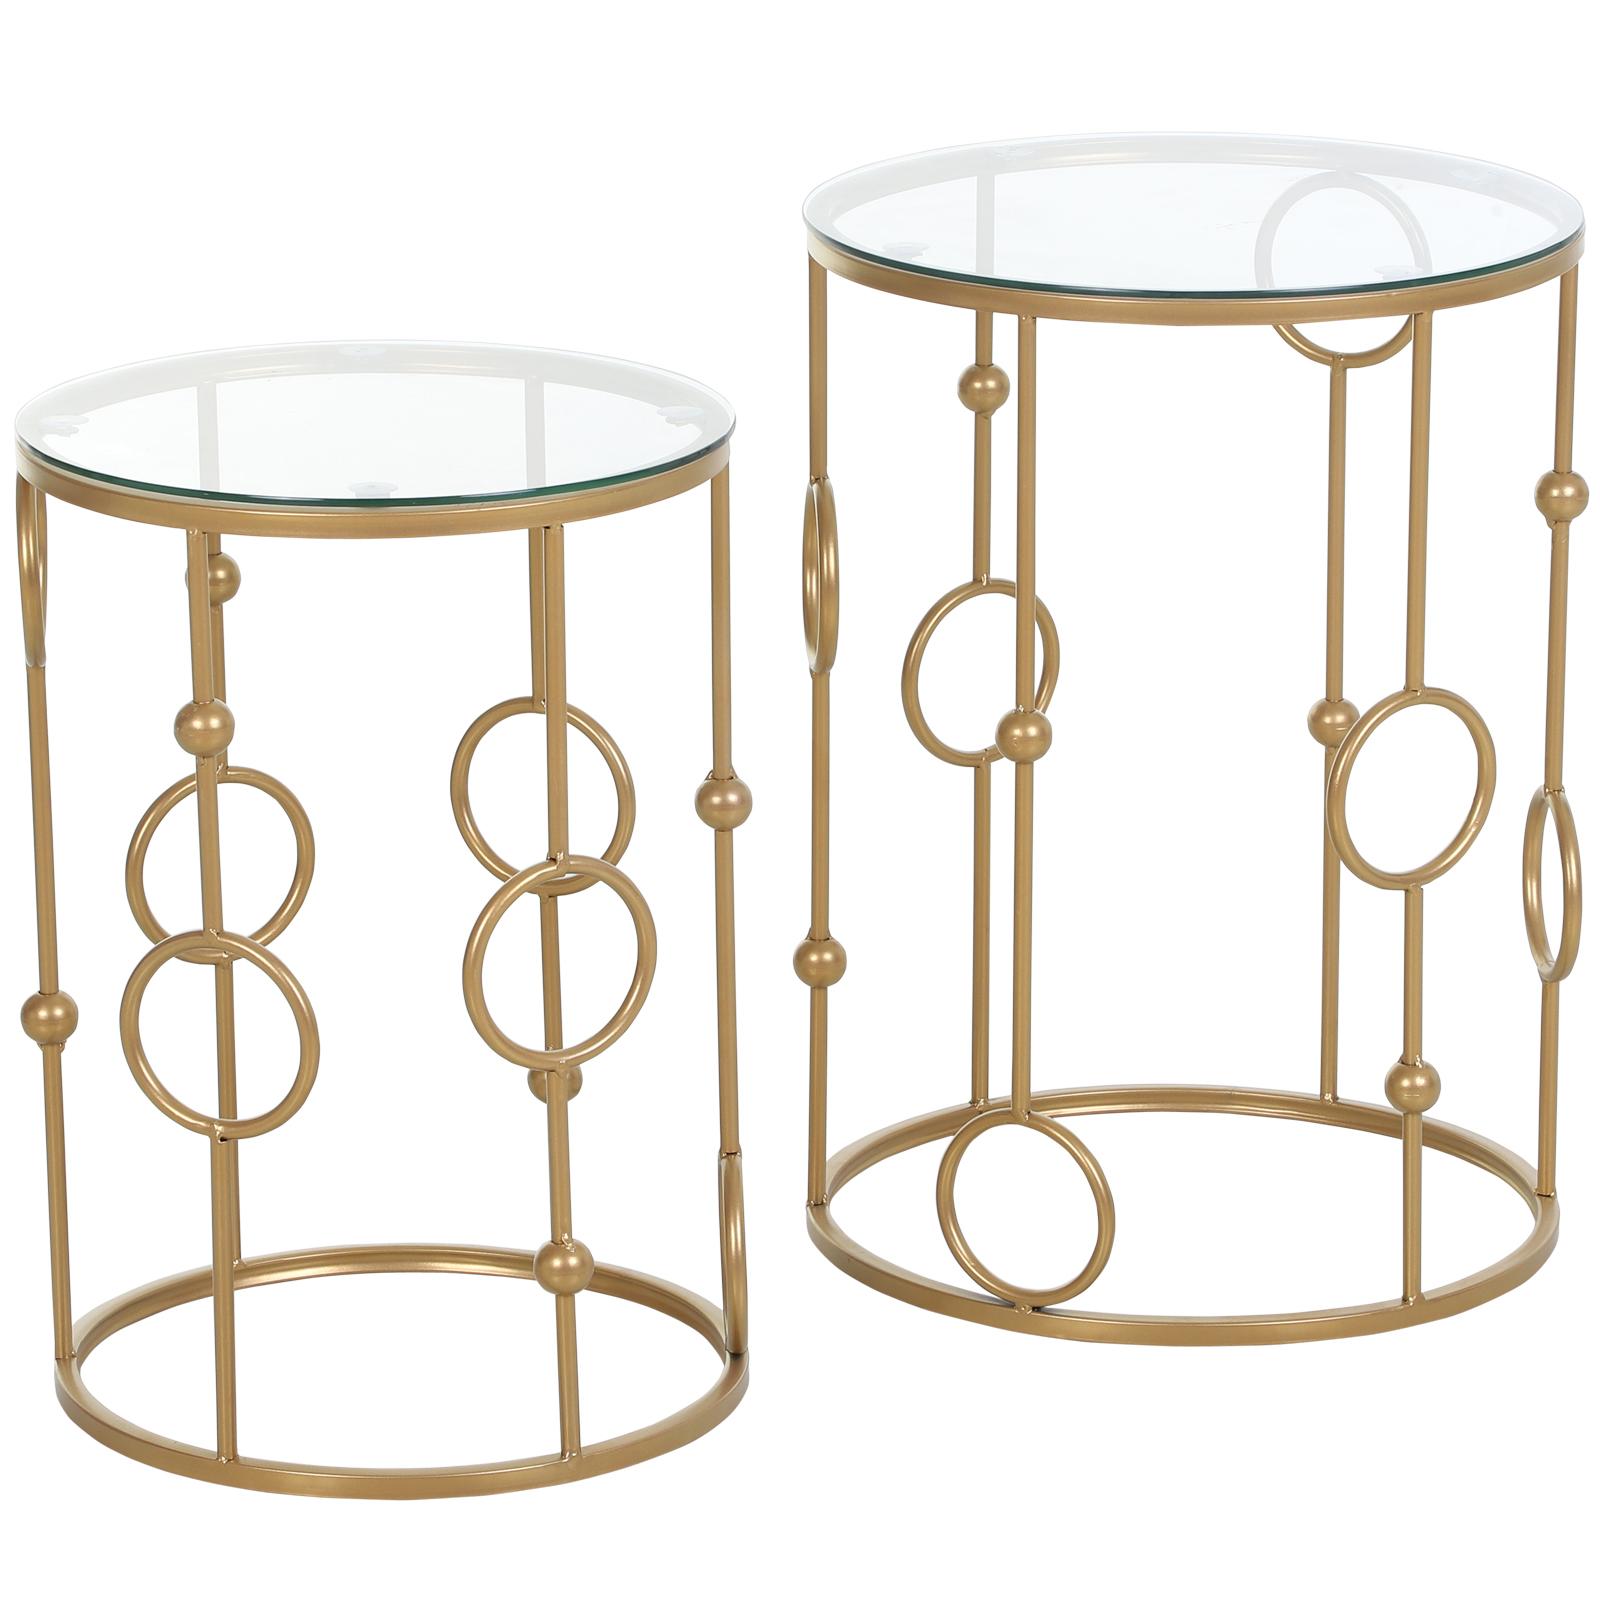 Homcom Set 2 Piese Masute de Cafea Design cu Modele de Cerc Metal si Sticla Temperata imagine aosom.ro